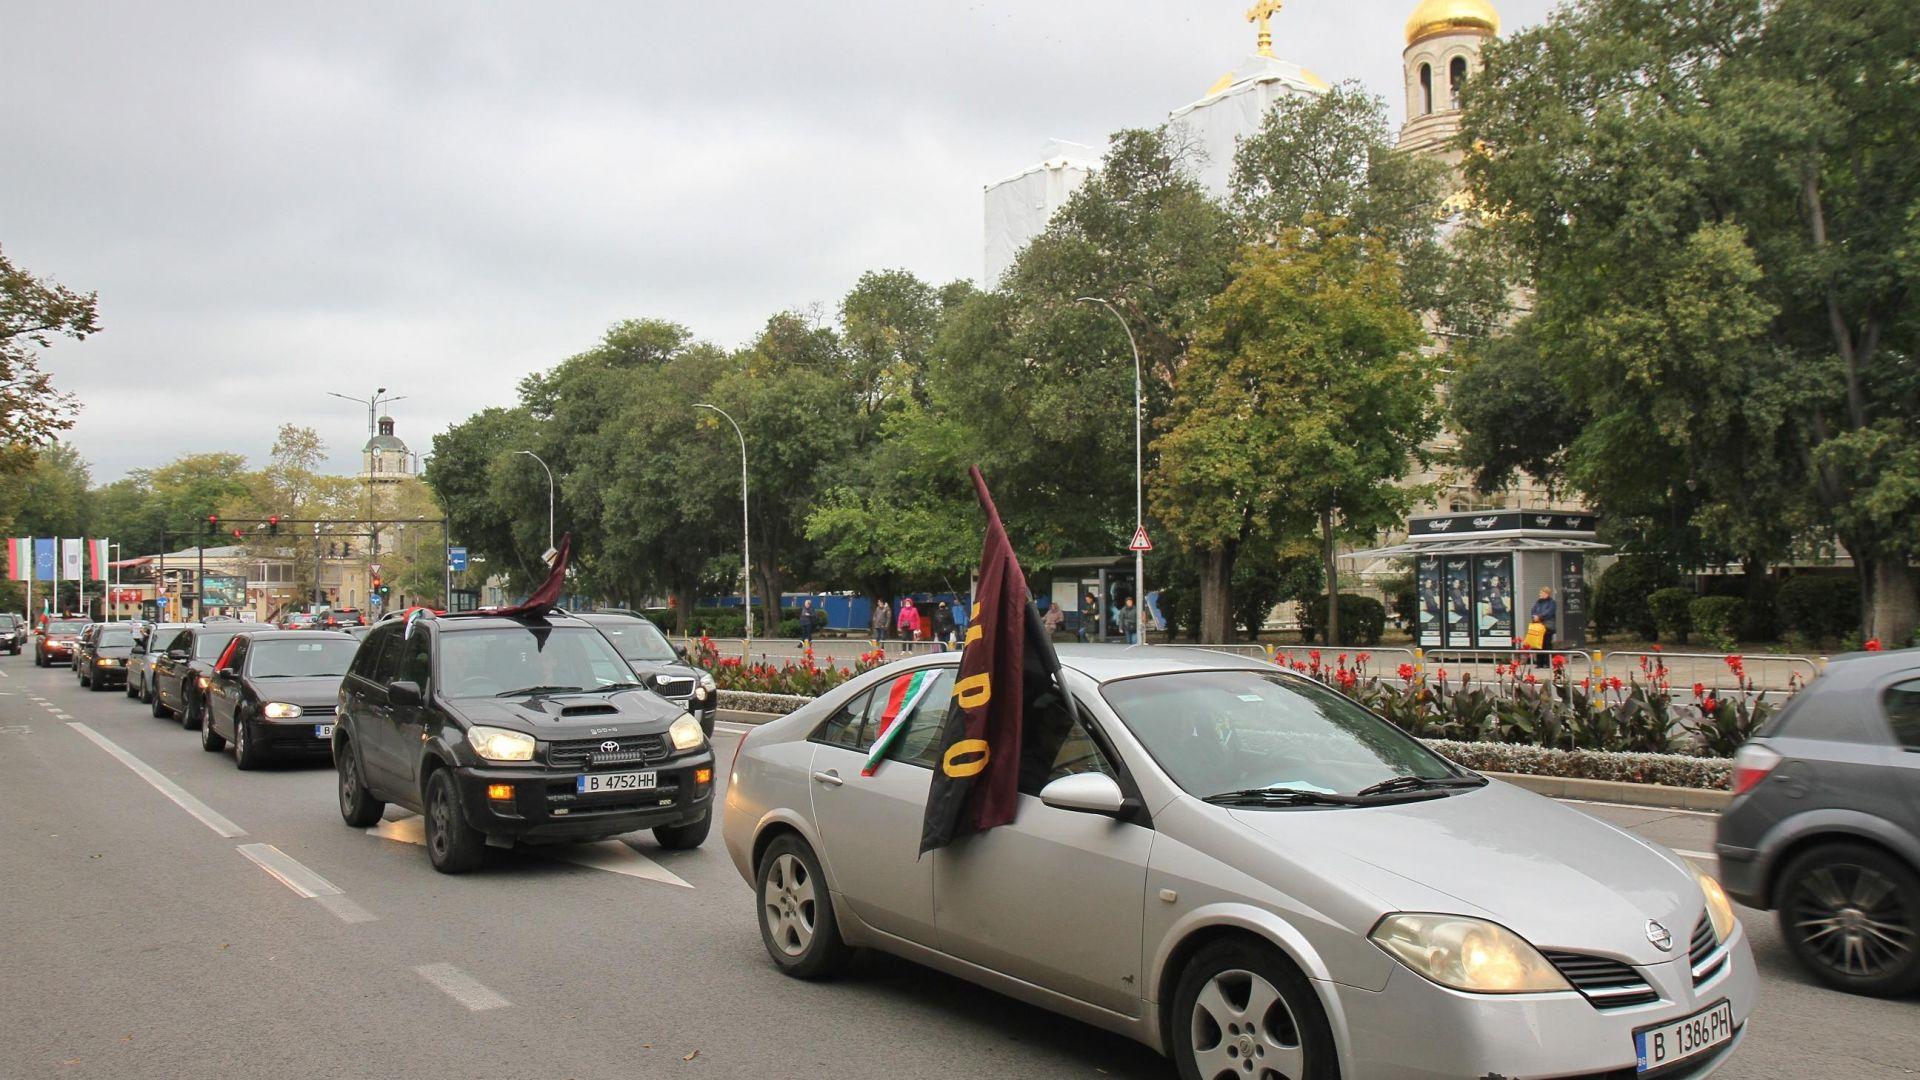 ВМРО поведе варненци и русенци на автопротест срещу високите цени на тока (снимки)